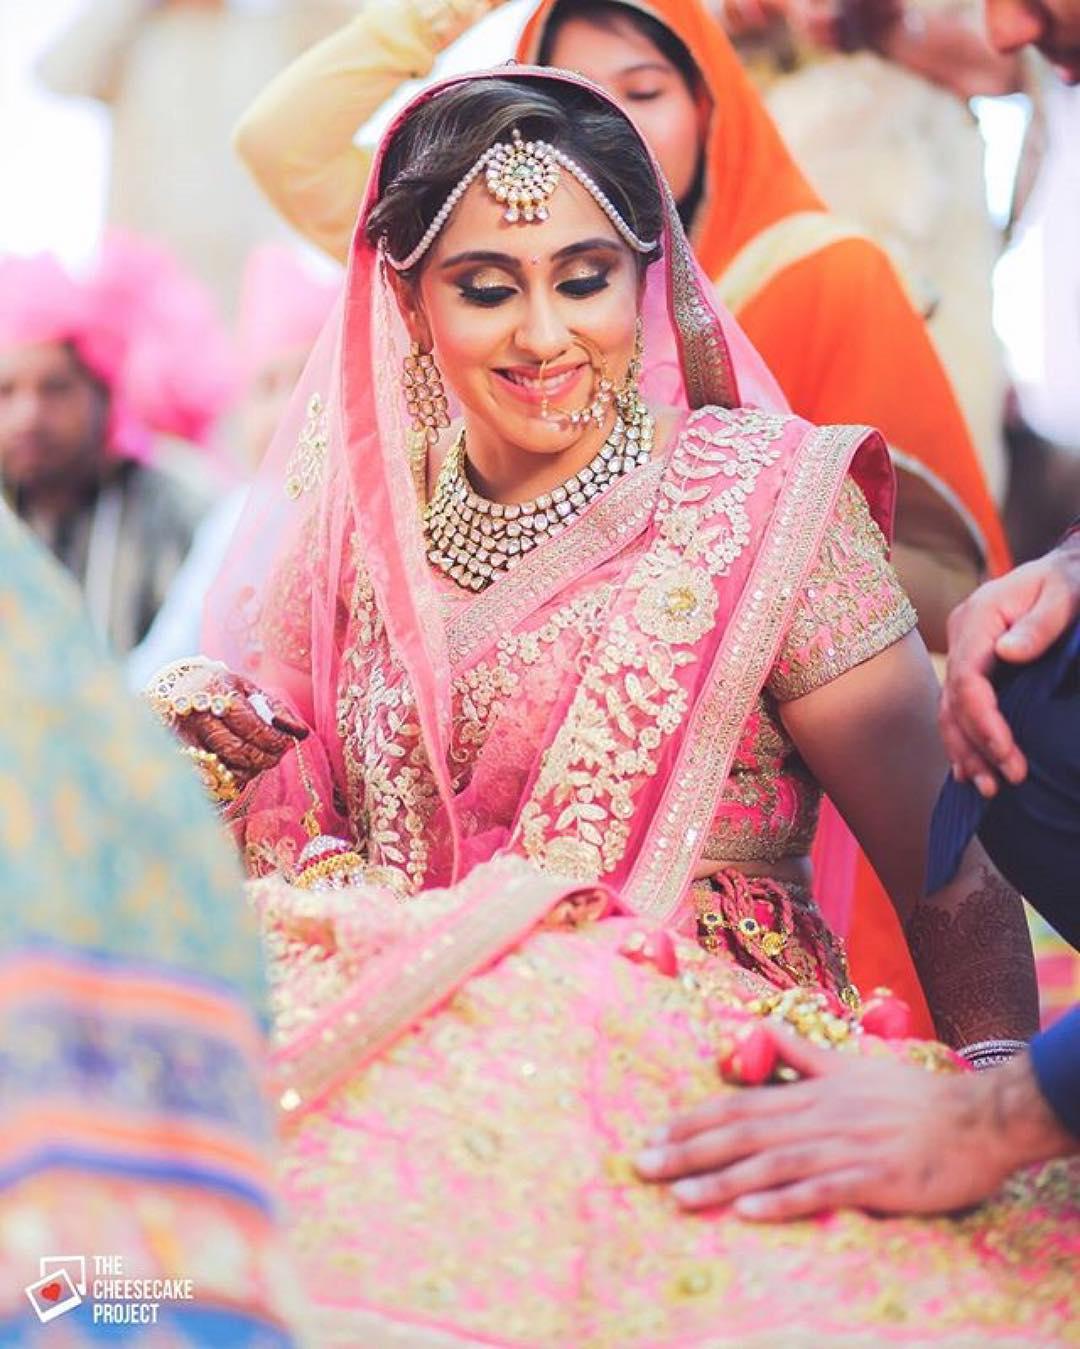 Bridal Beauty Countdown